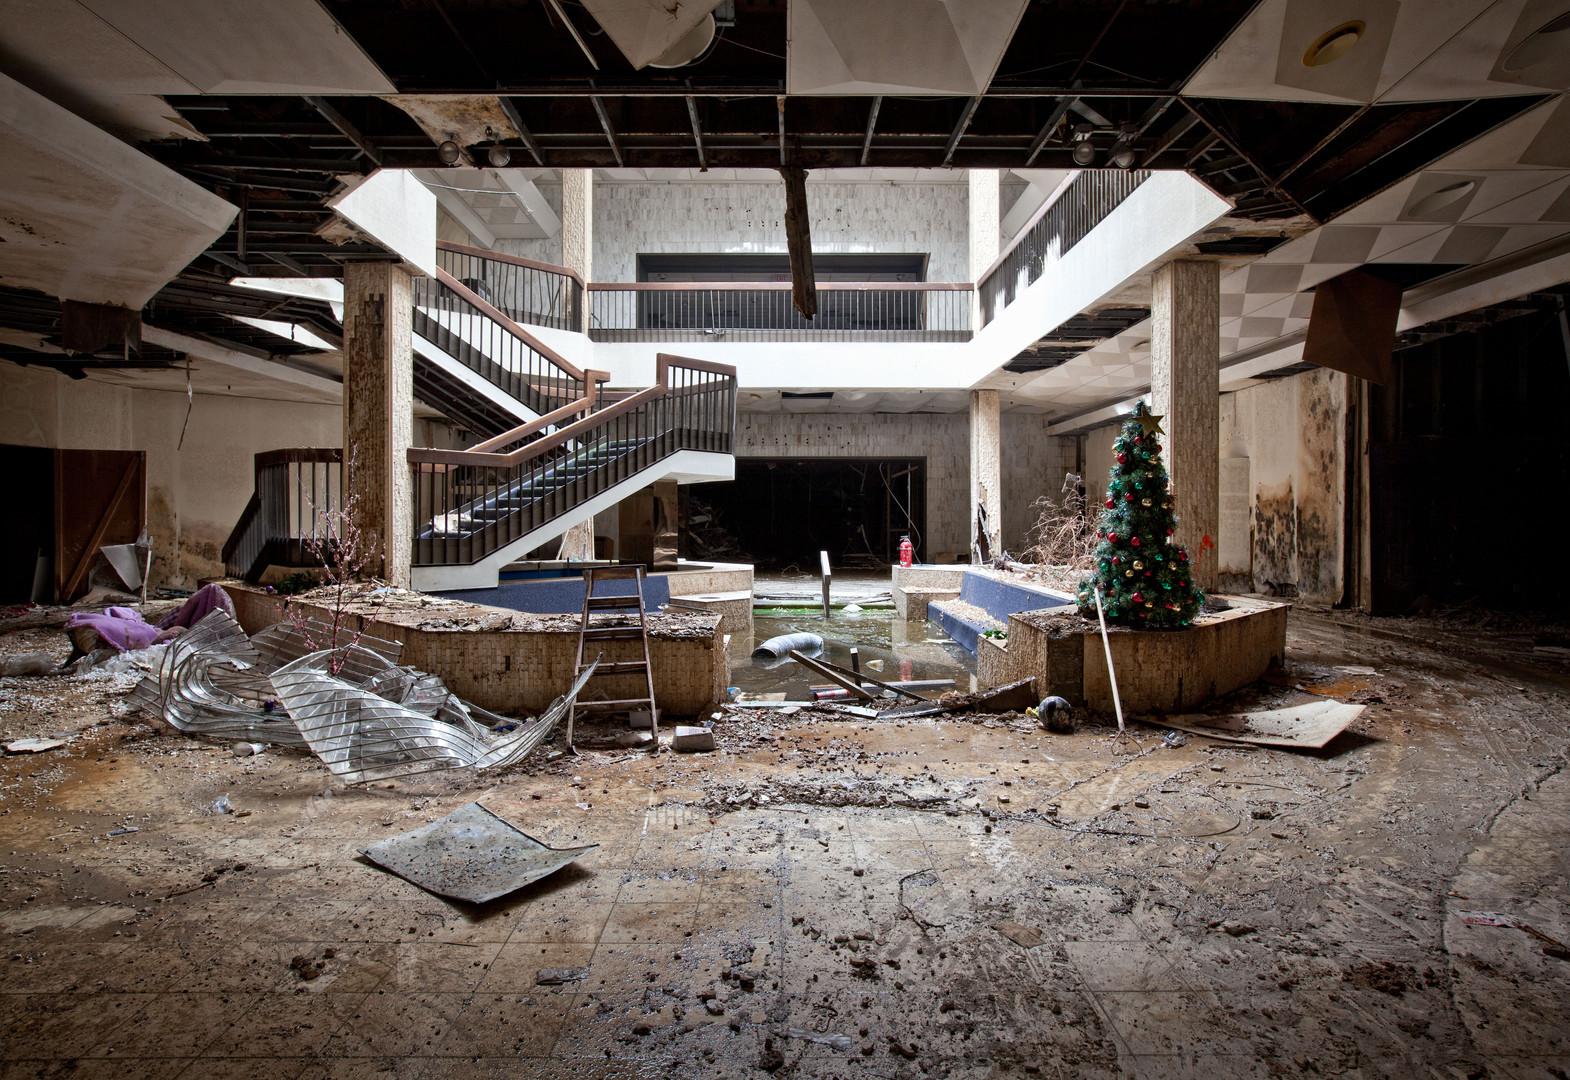 Randall Park Mall | Hidden In Shadows